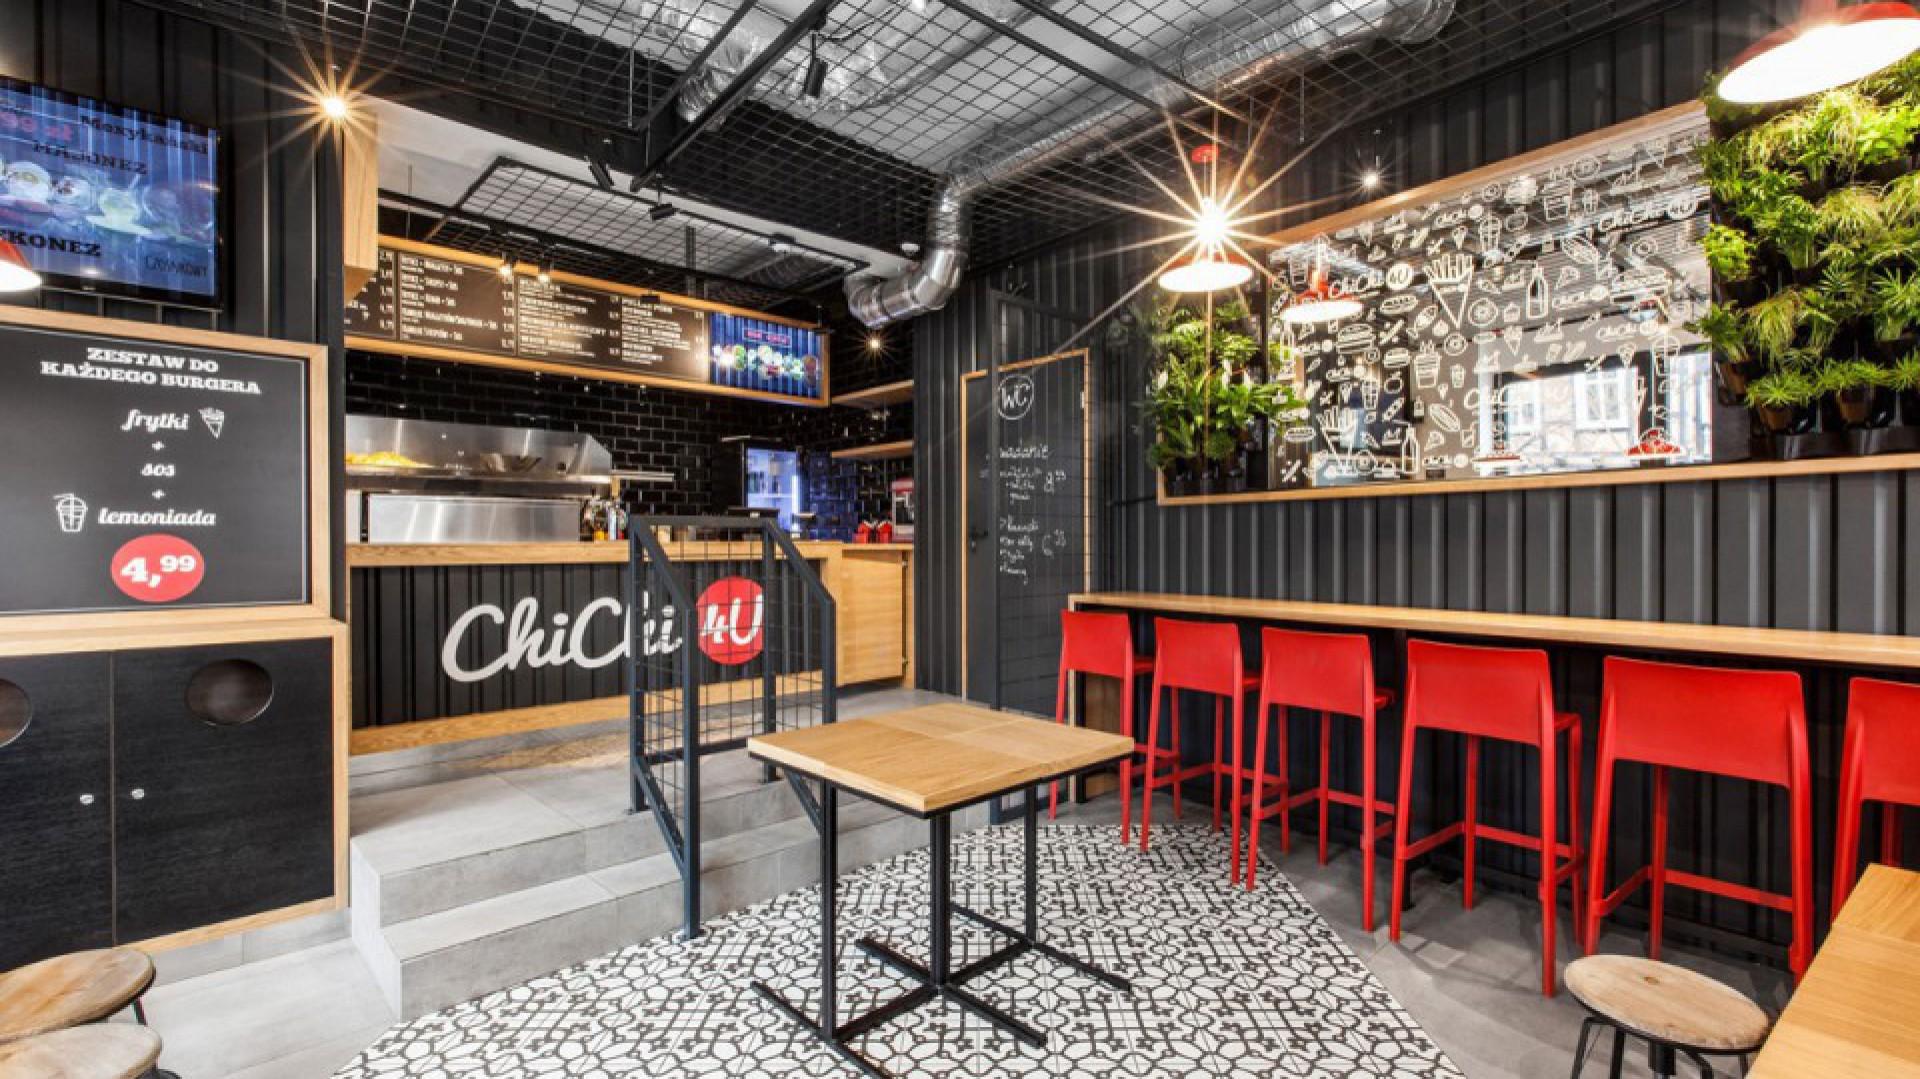 Projekt: ChiChi 4U Bar fot. Marcin Ratajcza